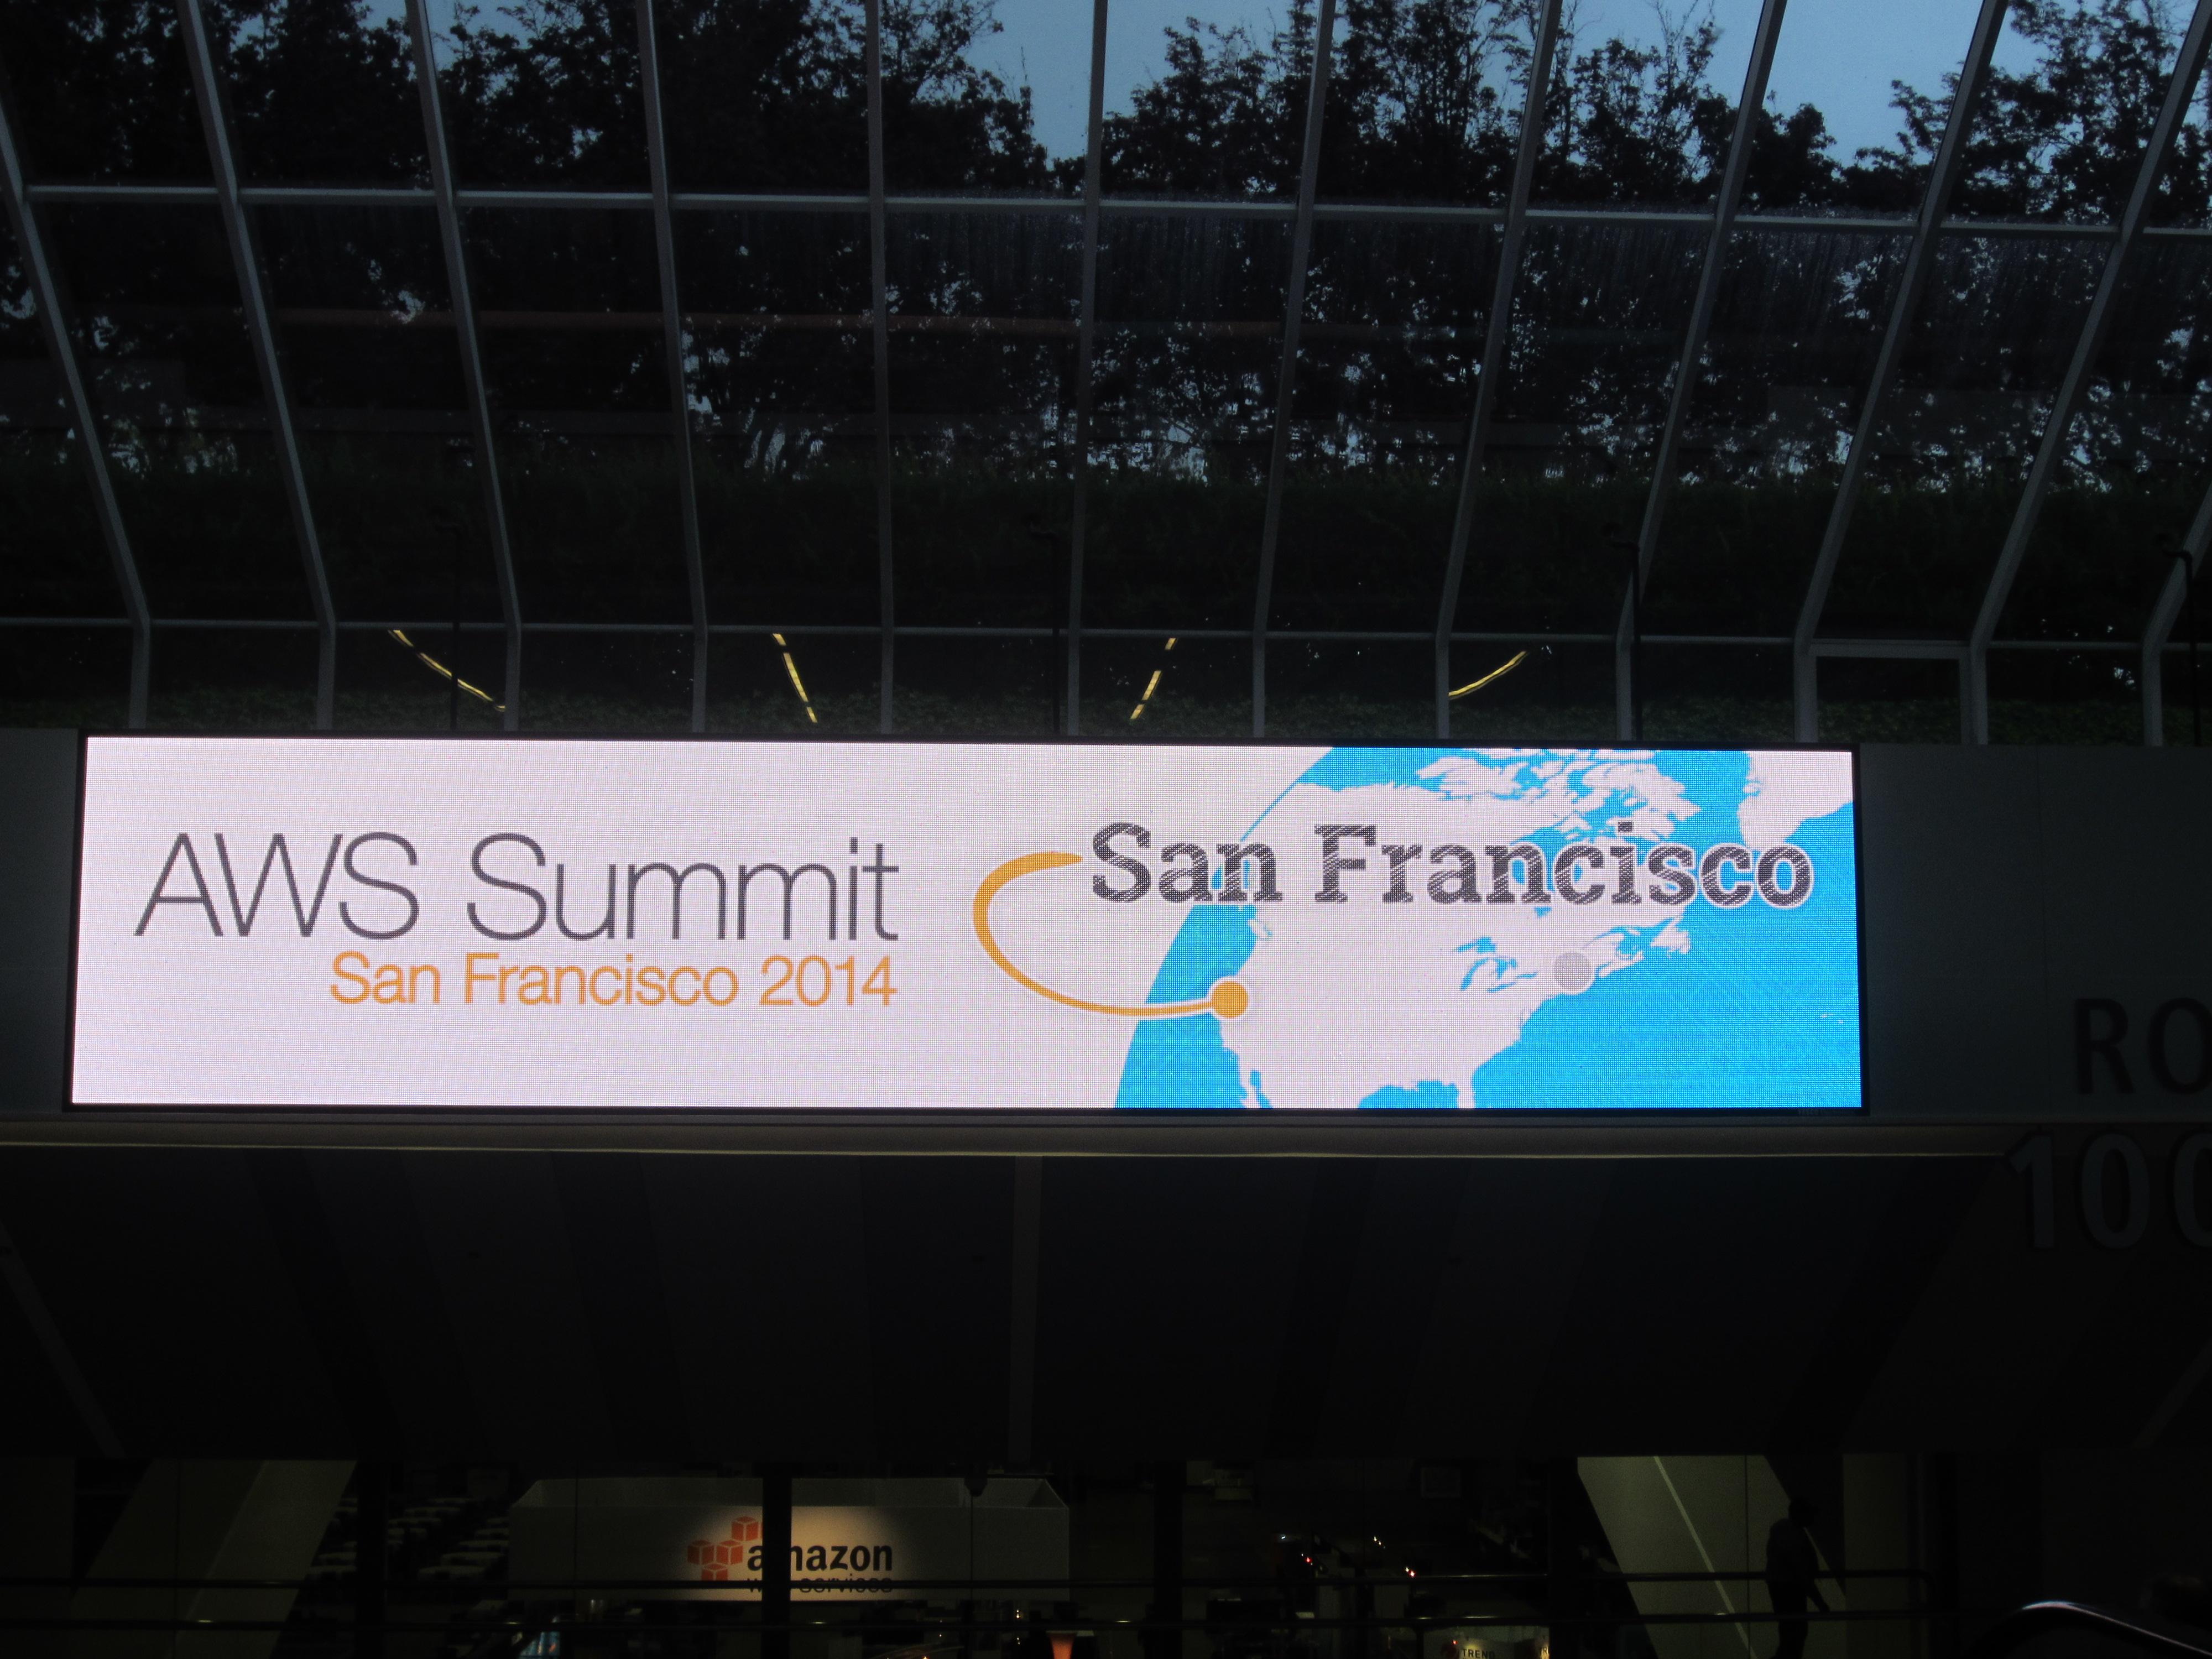 AWS Summit San Francisco